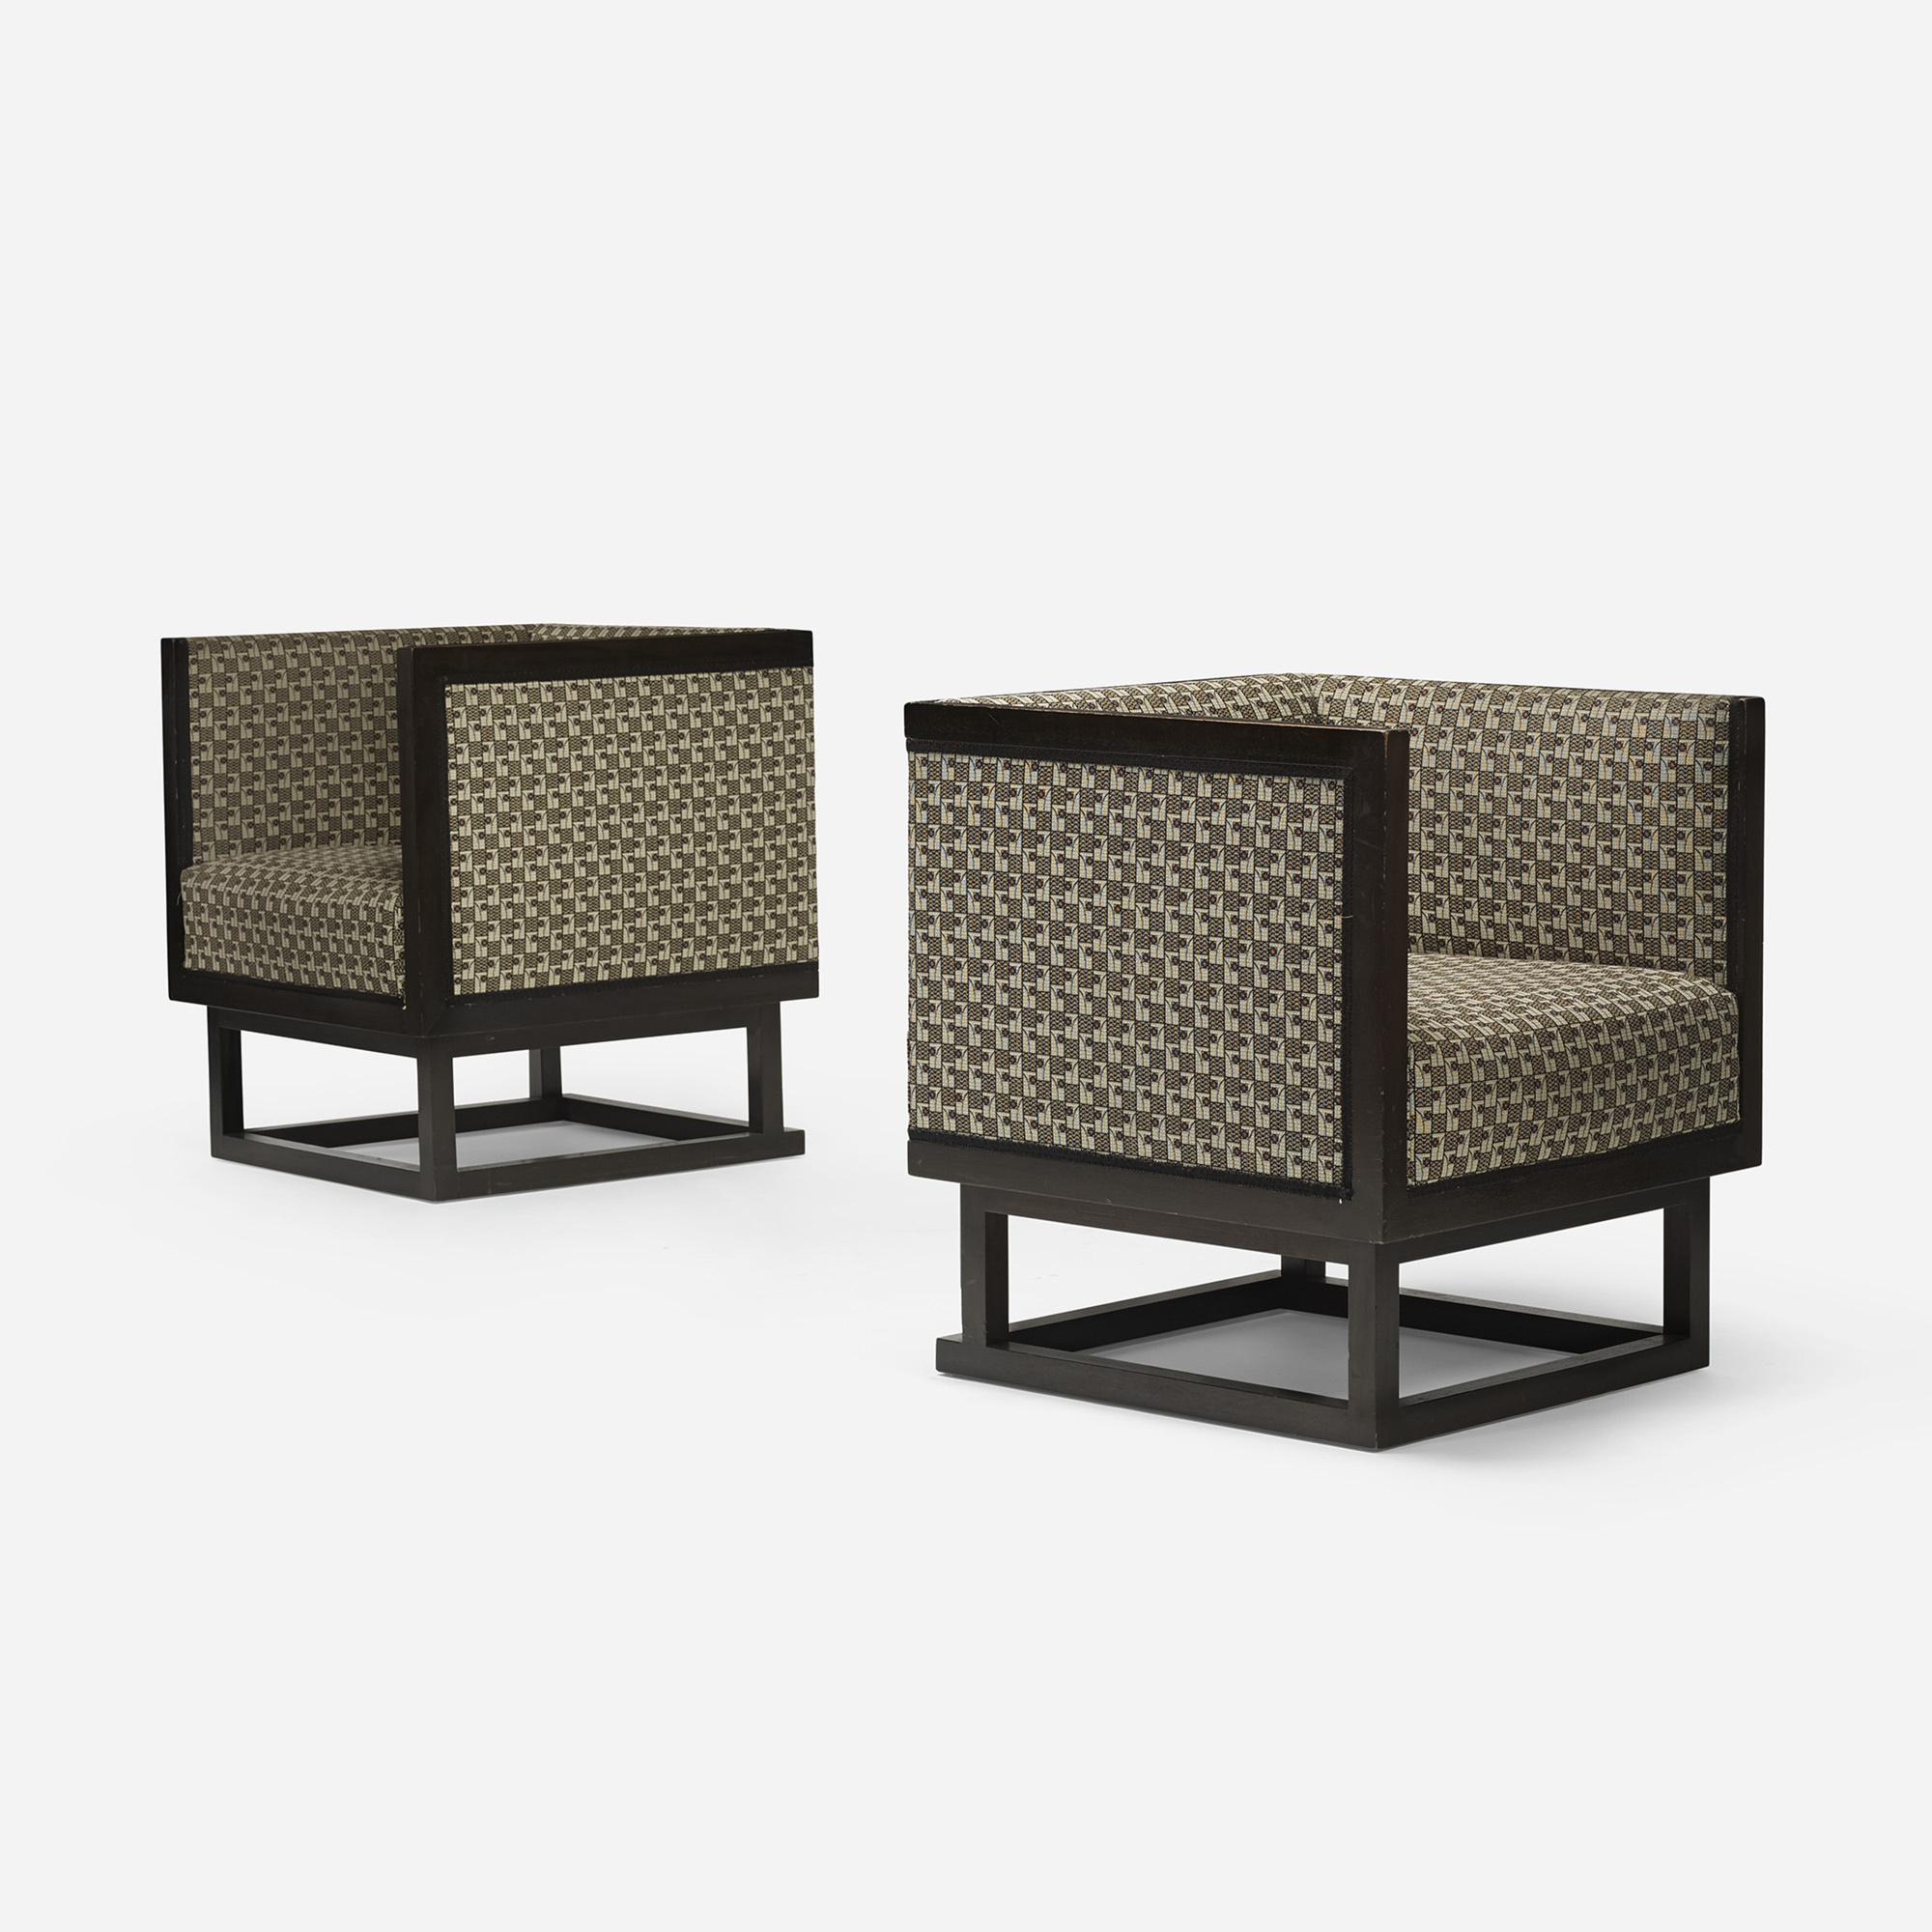 355: Josef Hoffmann / Cabinett lounge chairs, pair (1 of 5)